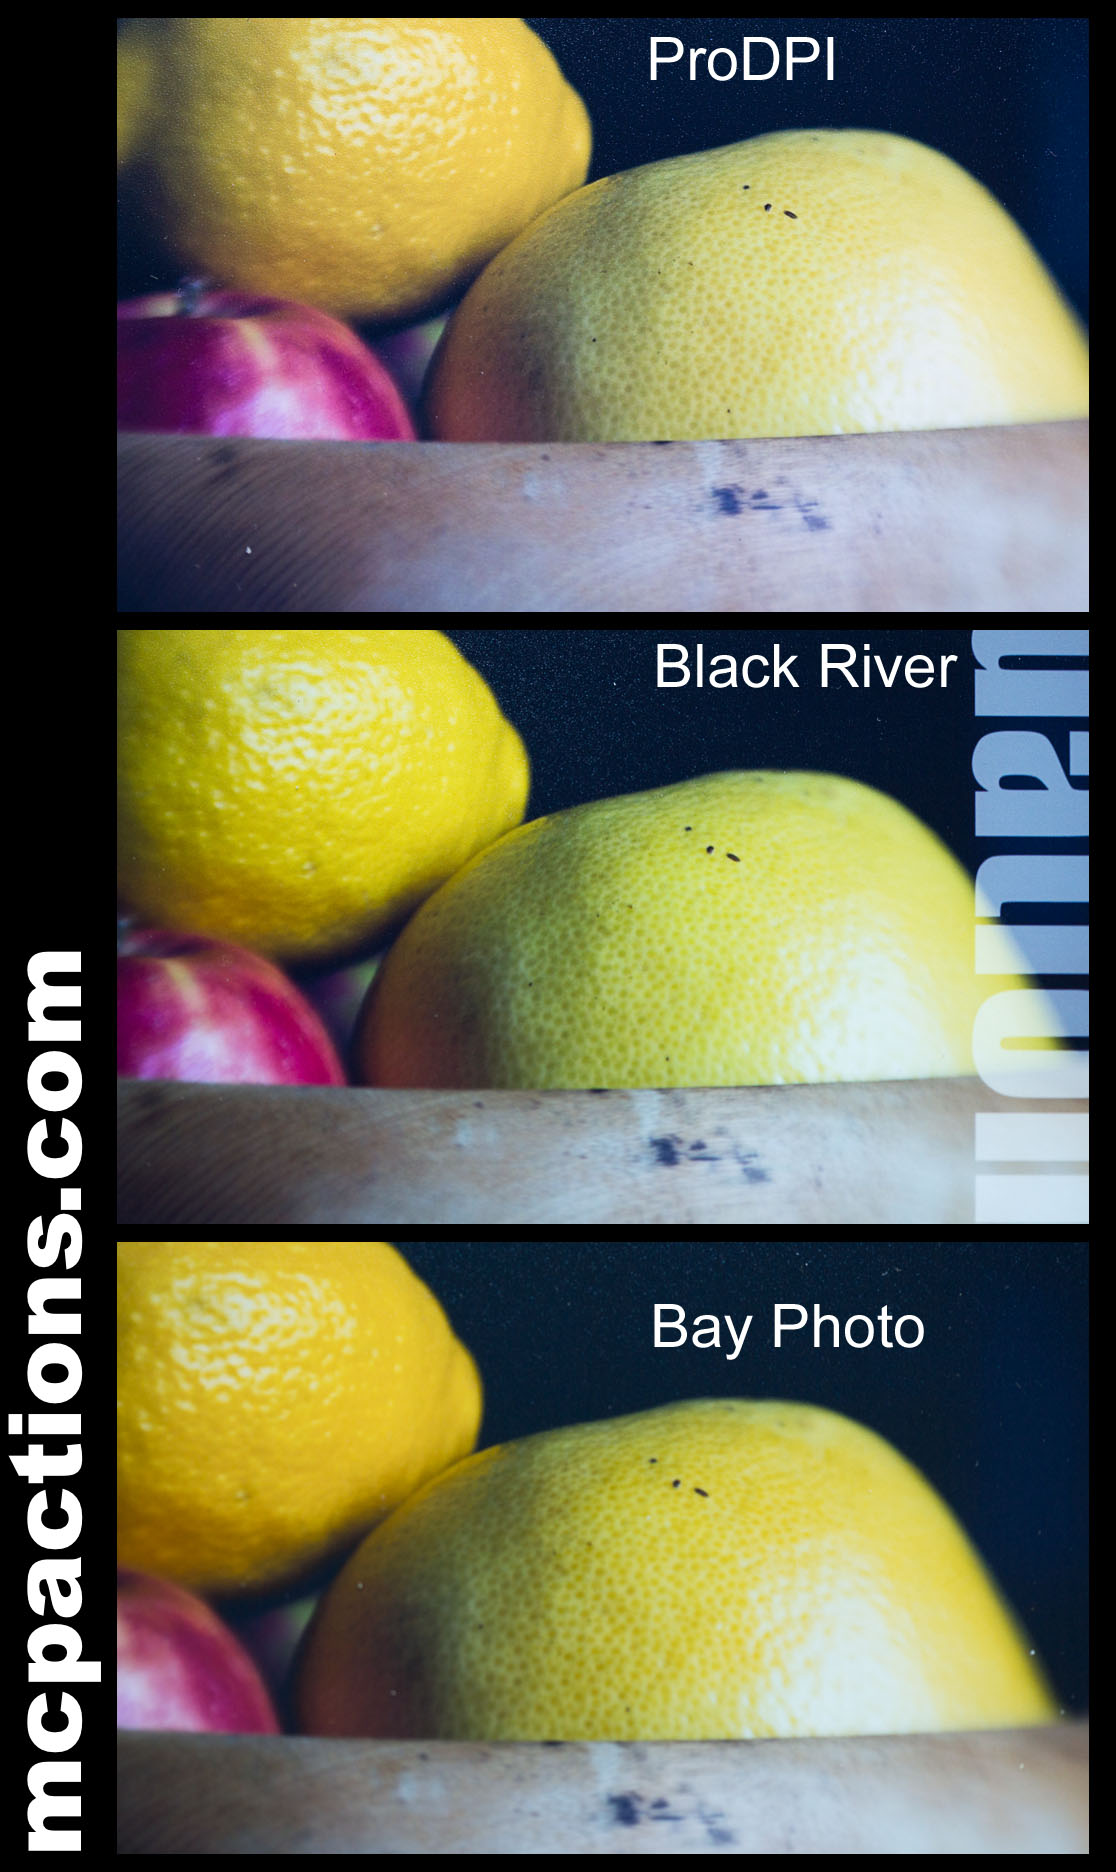 Bay-photo-orange-lemon The Pro Photo Lab VS Consumer Photo Lab Battle Business Tips Guest Bloggers